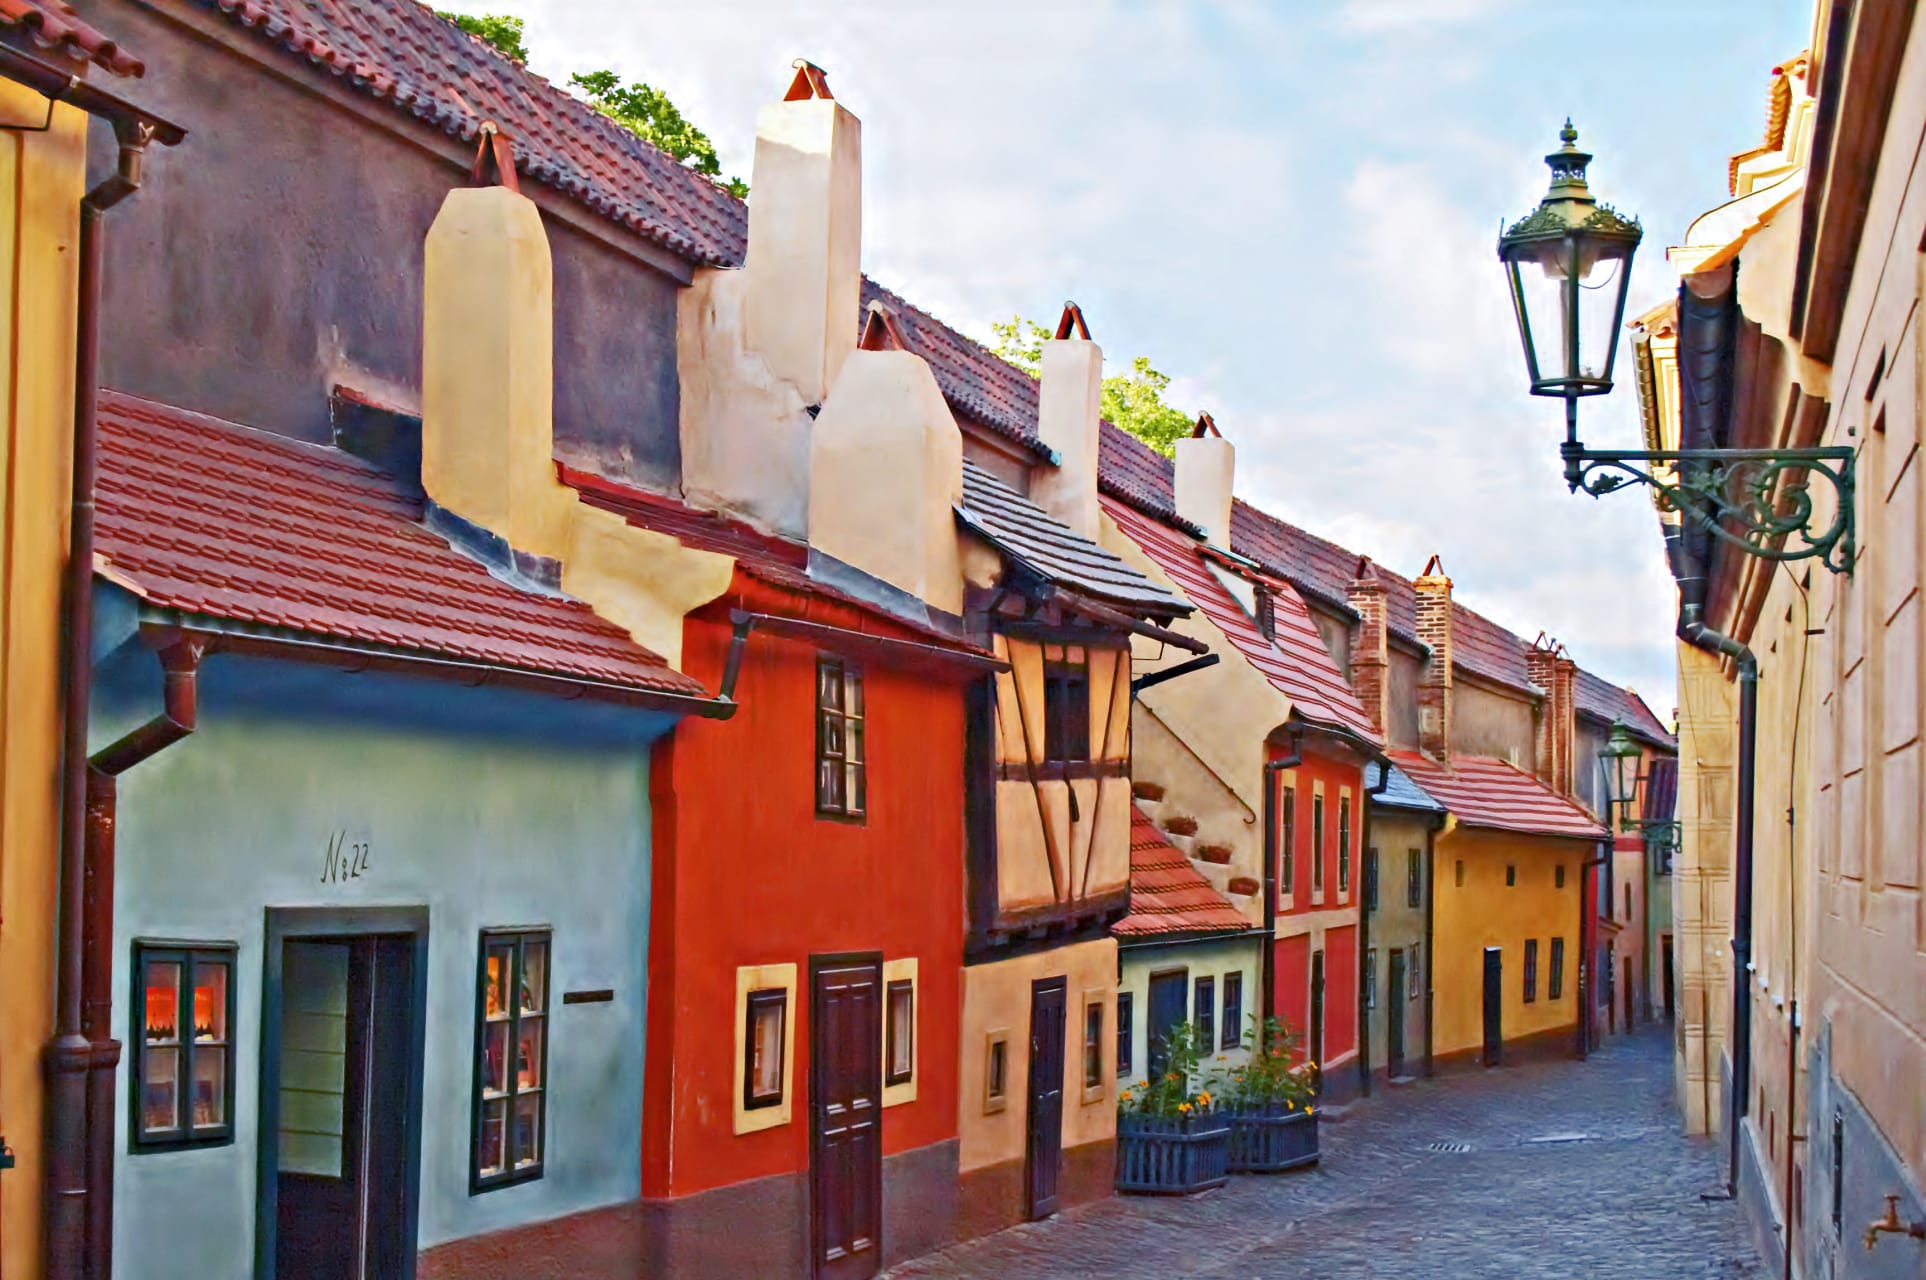 Prague - Architecture and Symbolism beneath Prague Castle